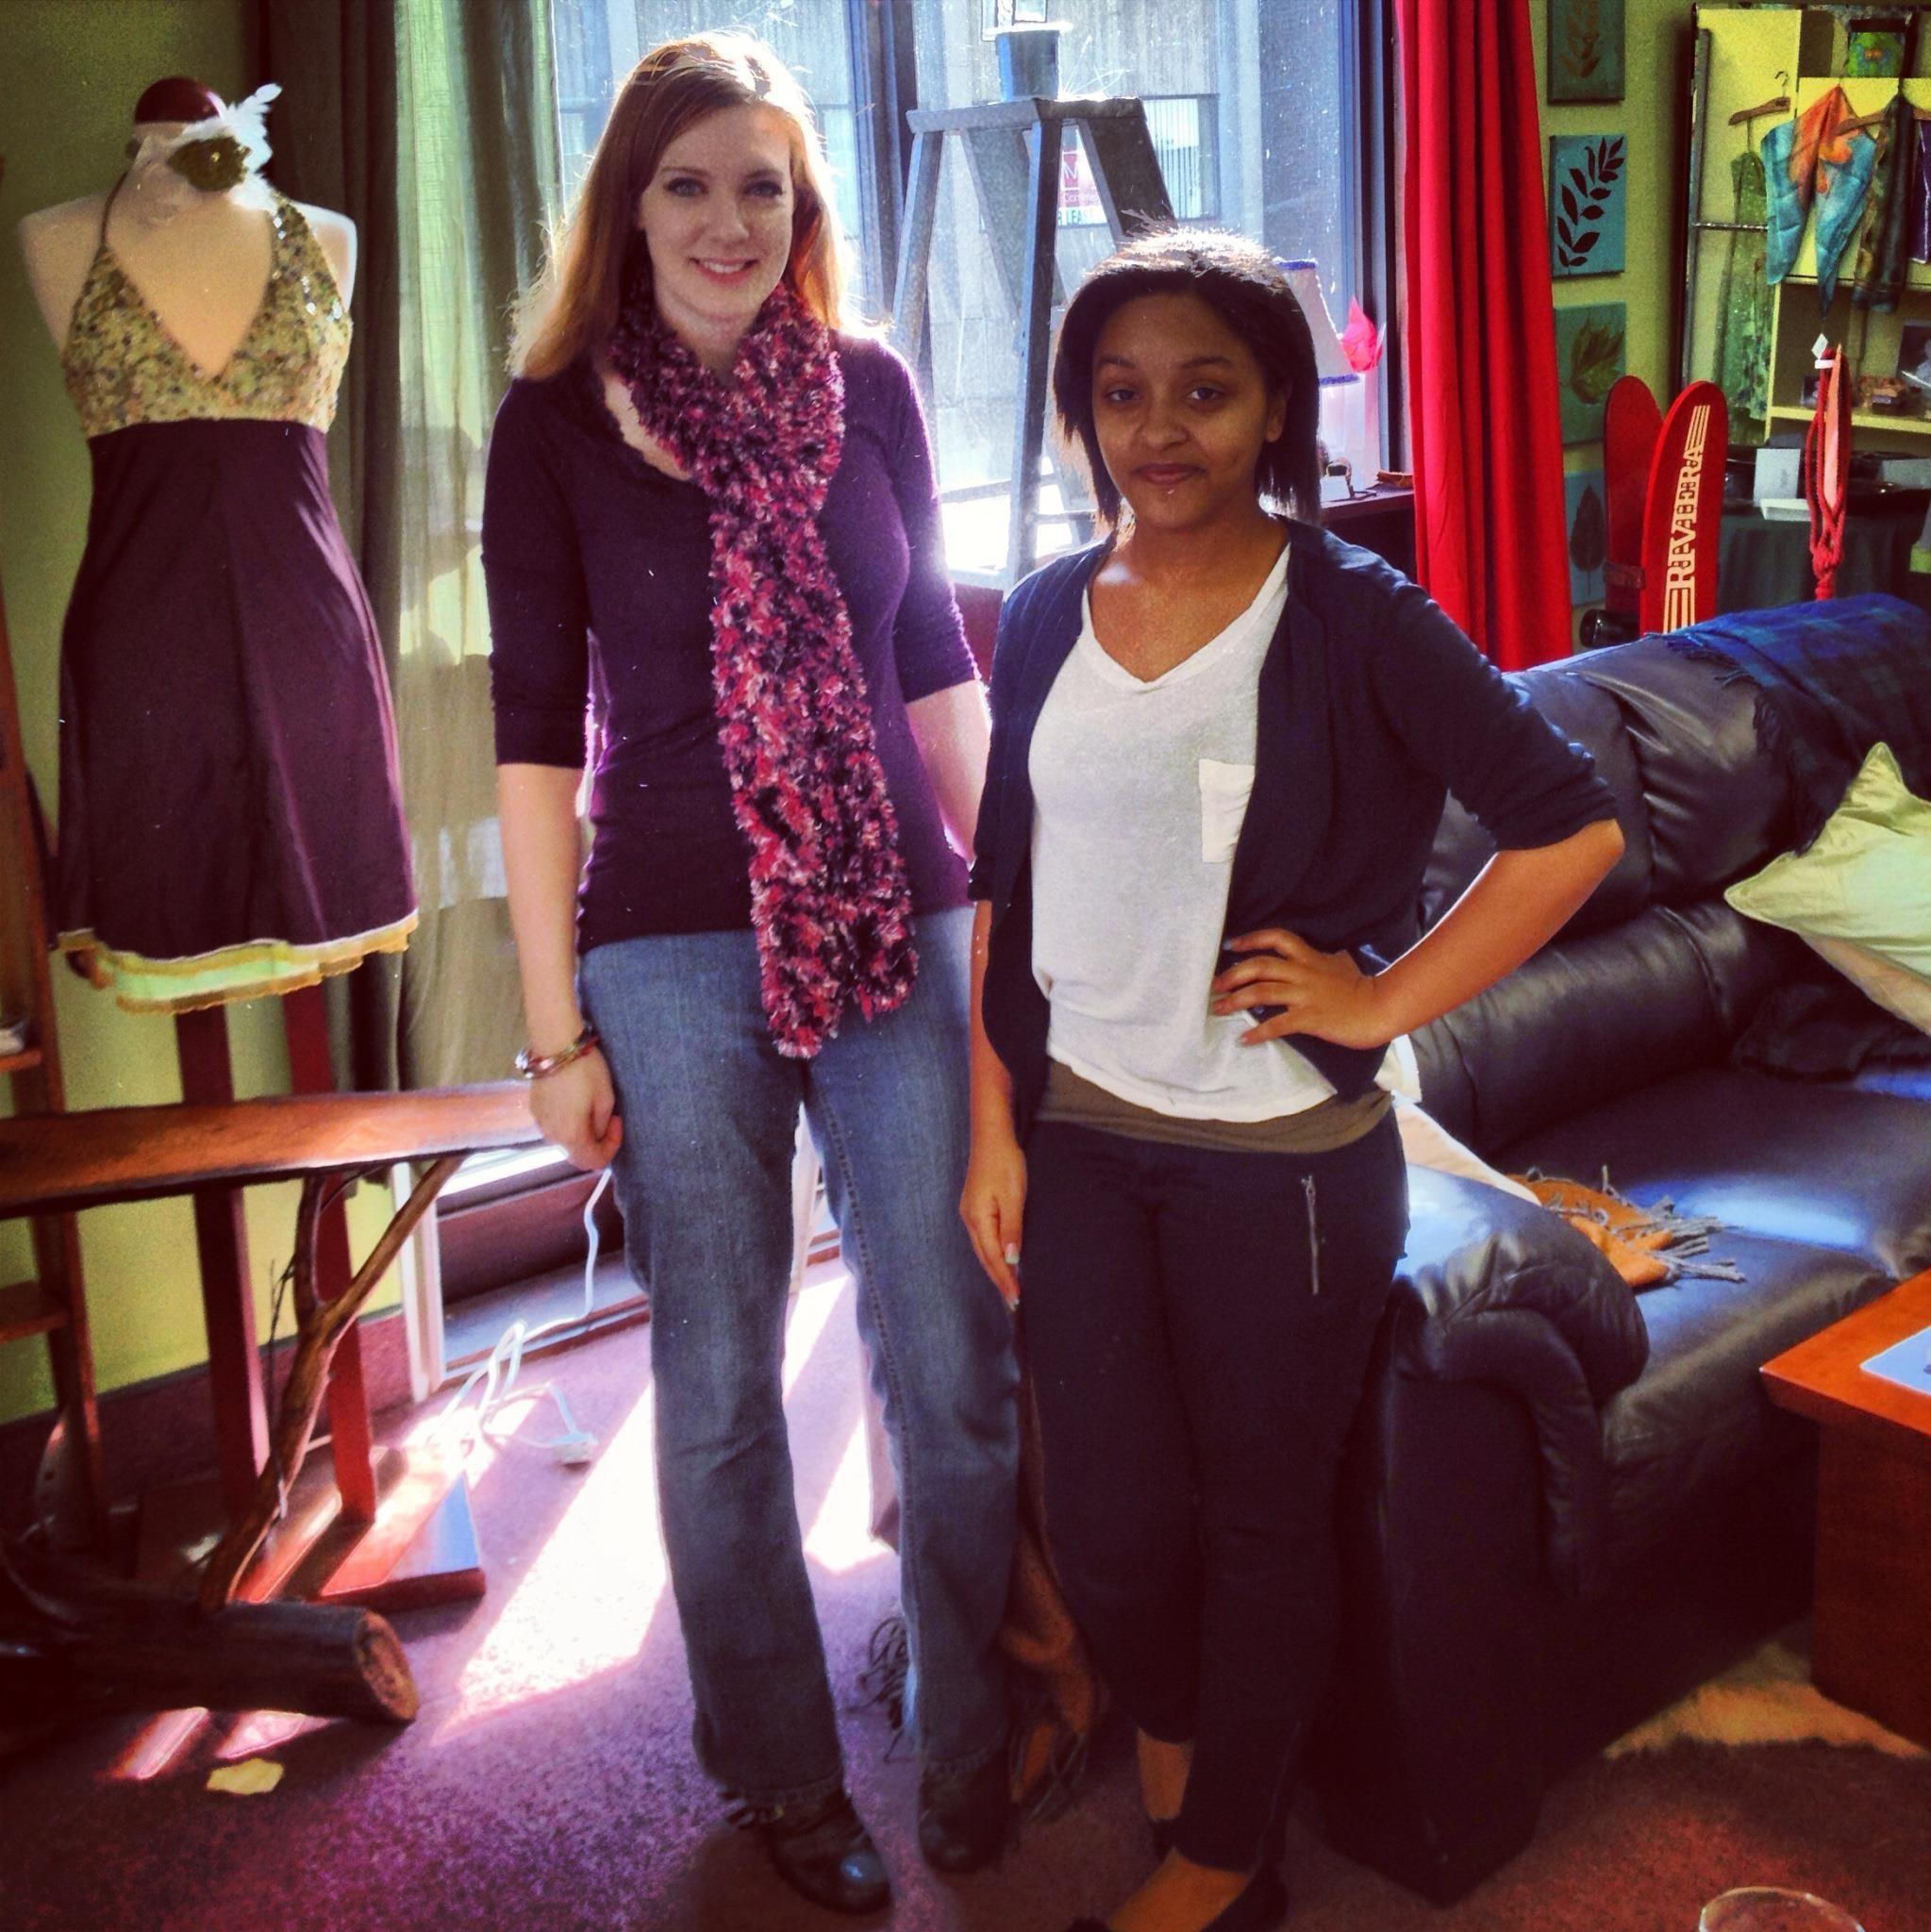 Learning academics through fashion.